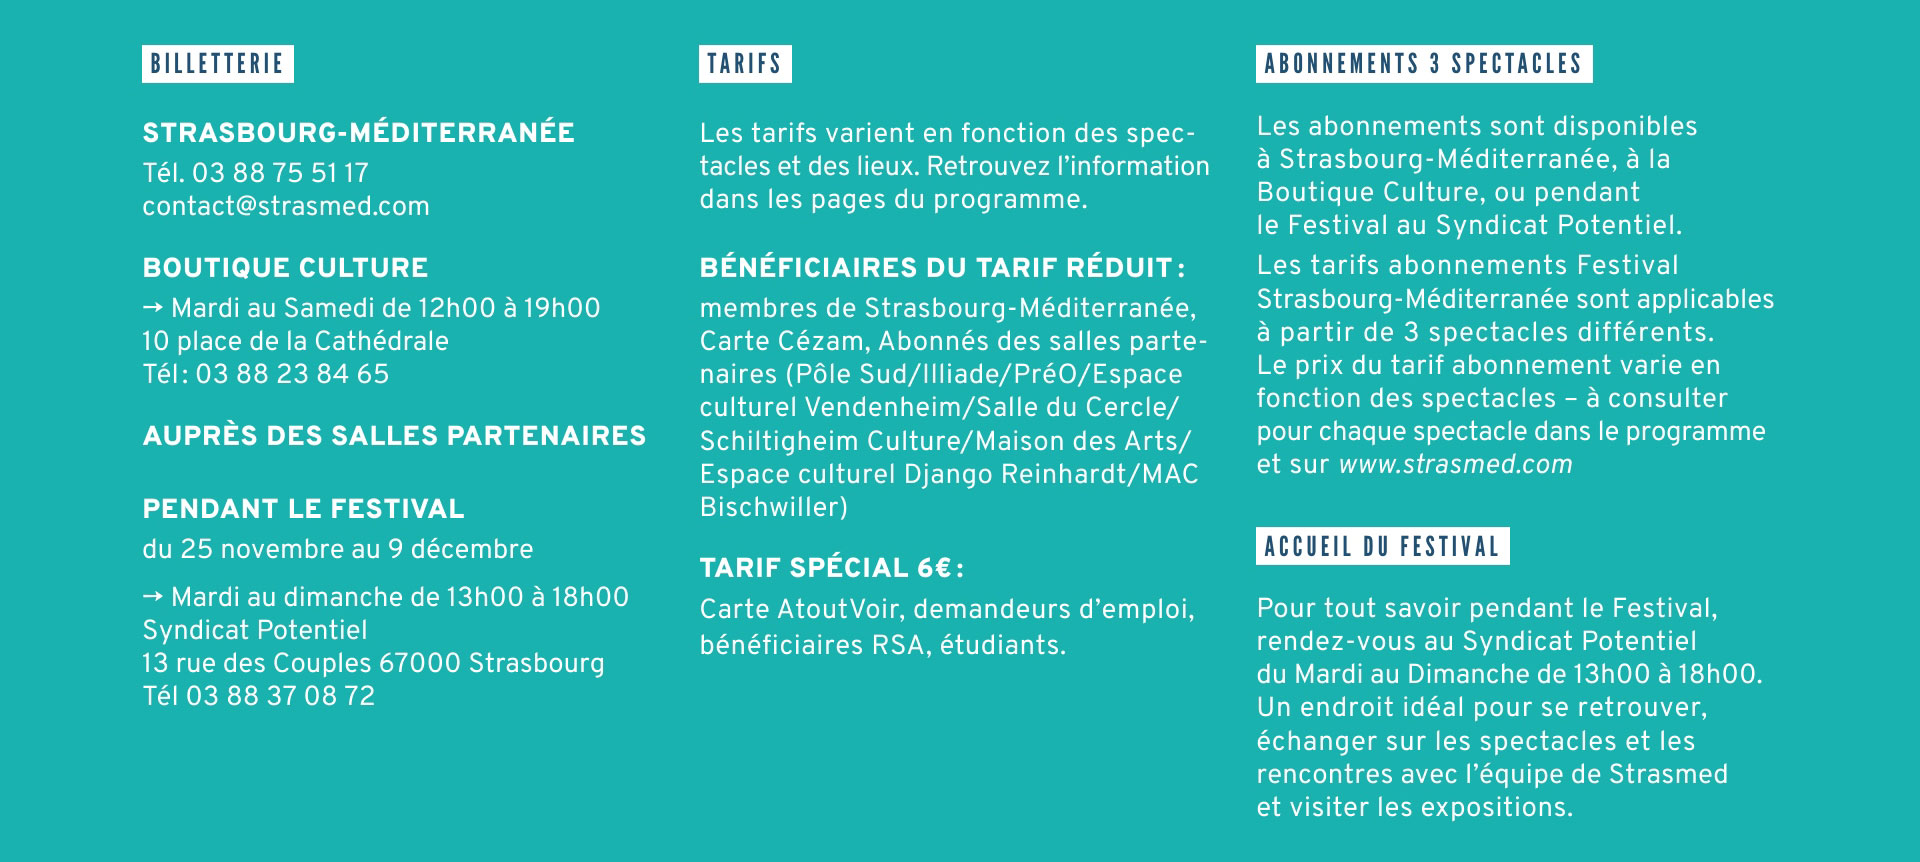 infos-pratiques_2017